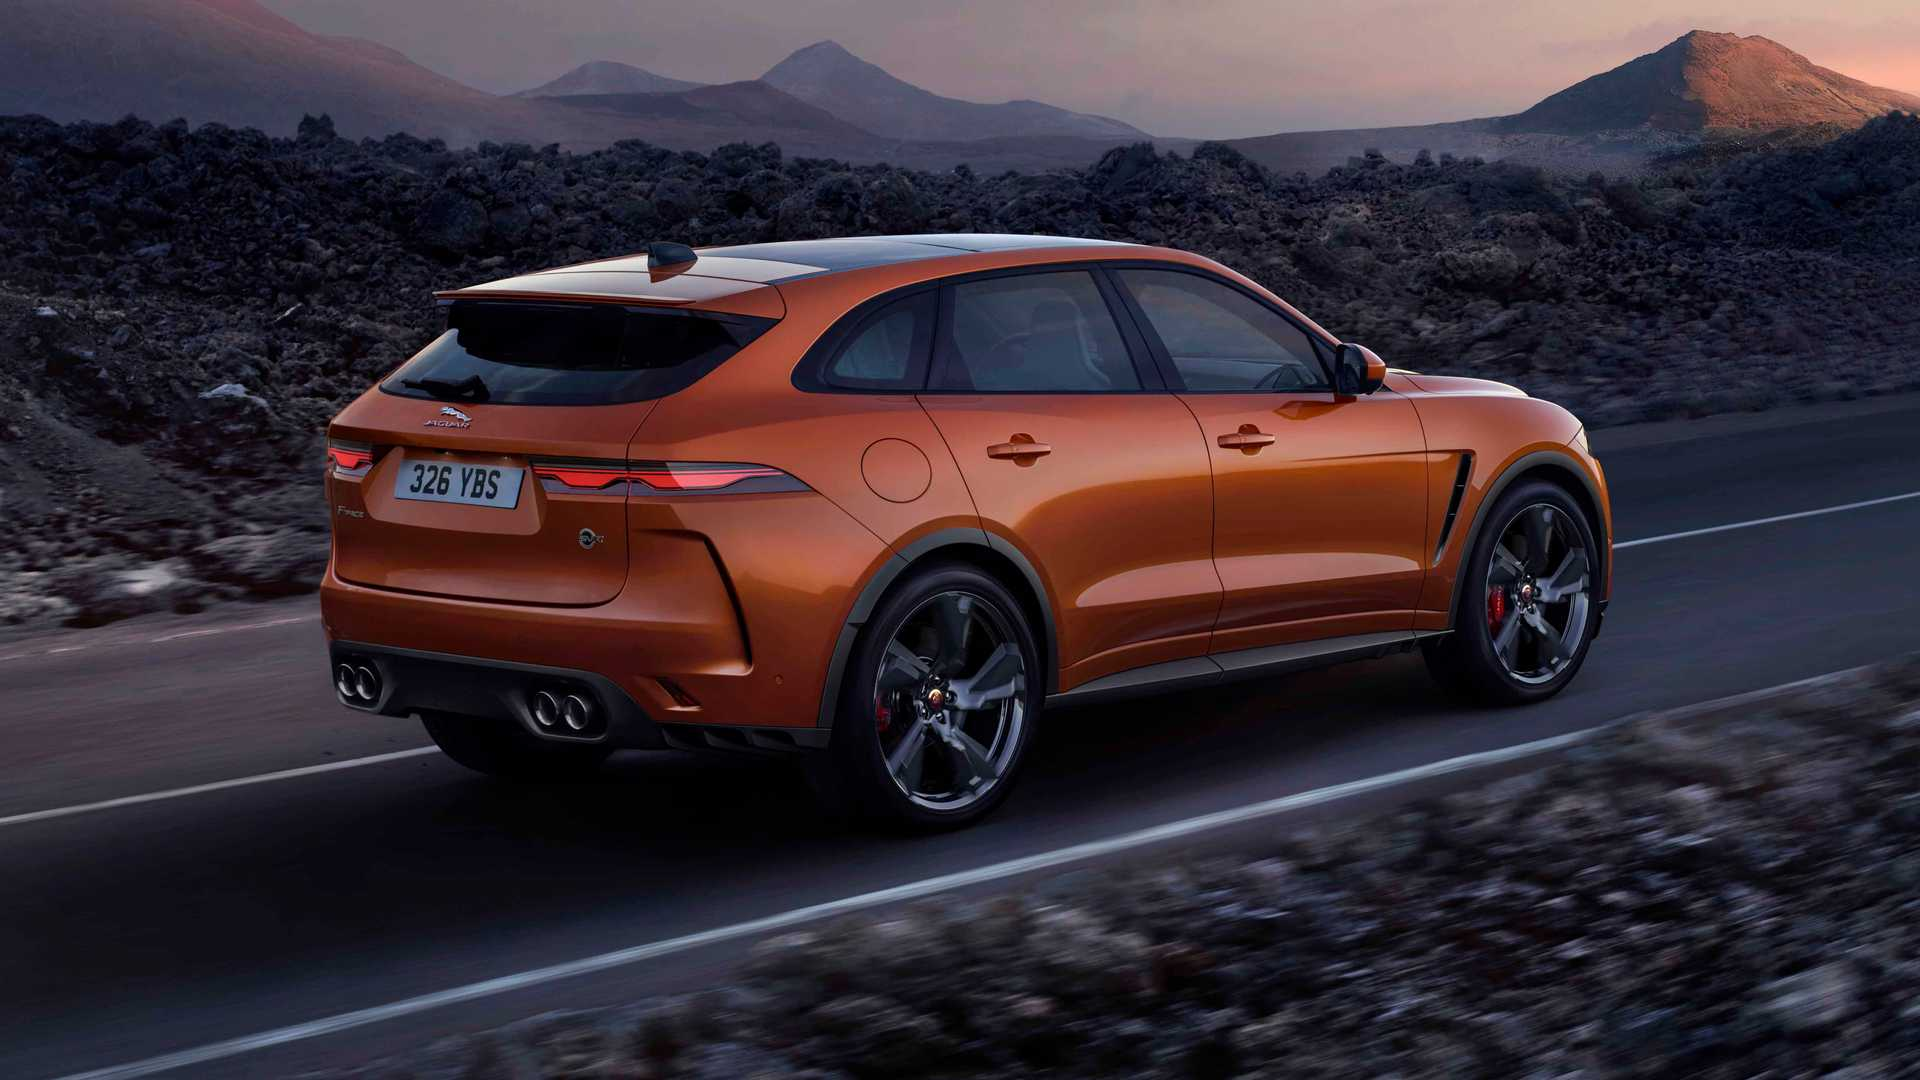 2021 jaguar f-pace svr debuts with better acceleration